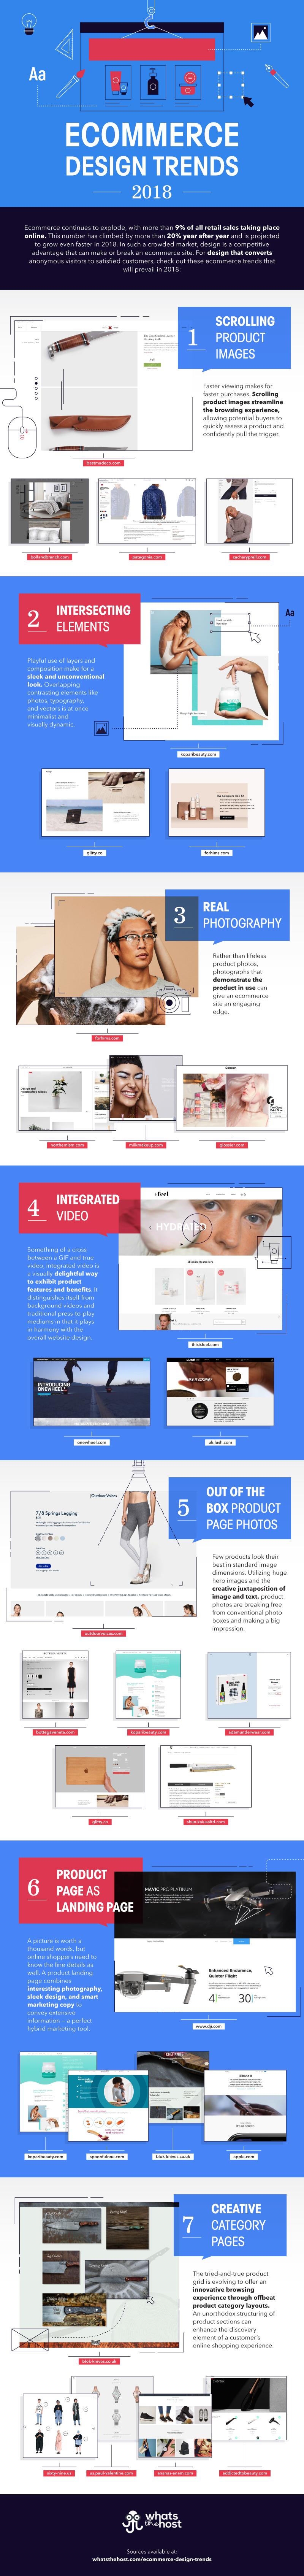 7 Ecommerce Web Design Trends For 2018